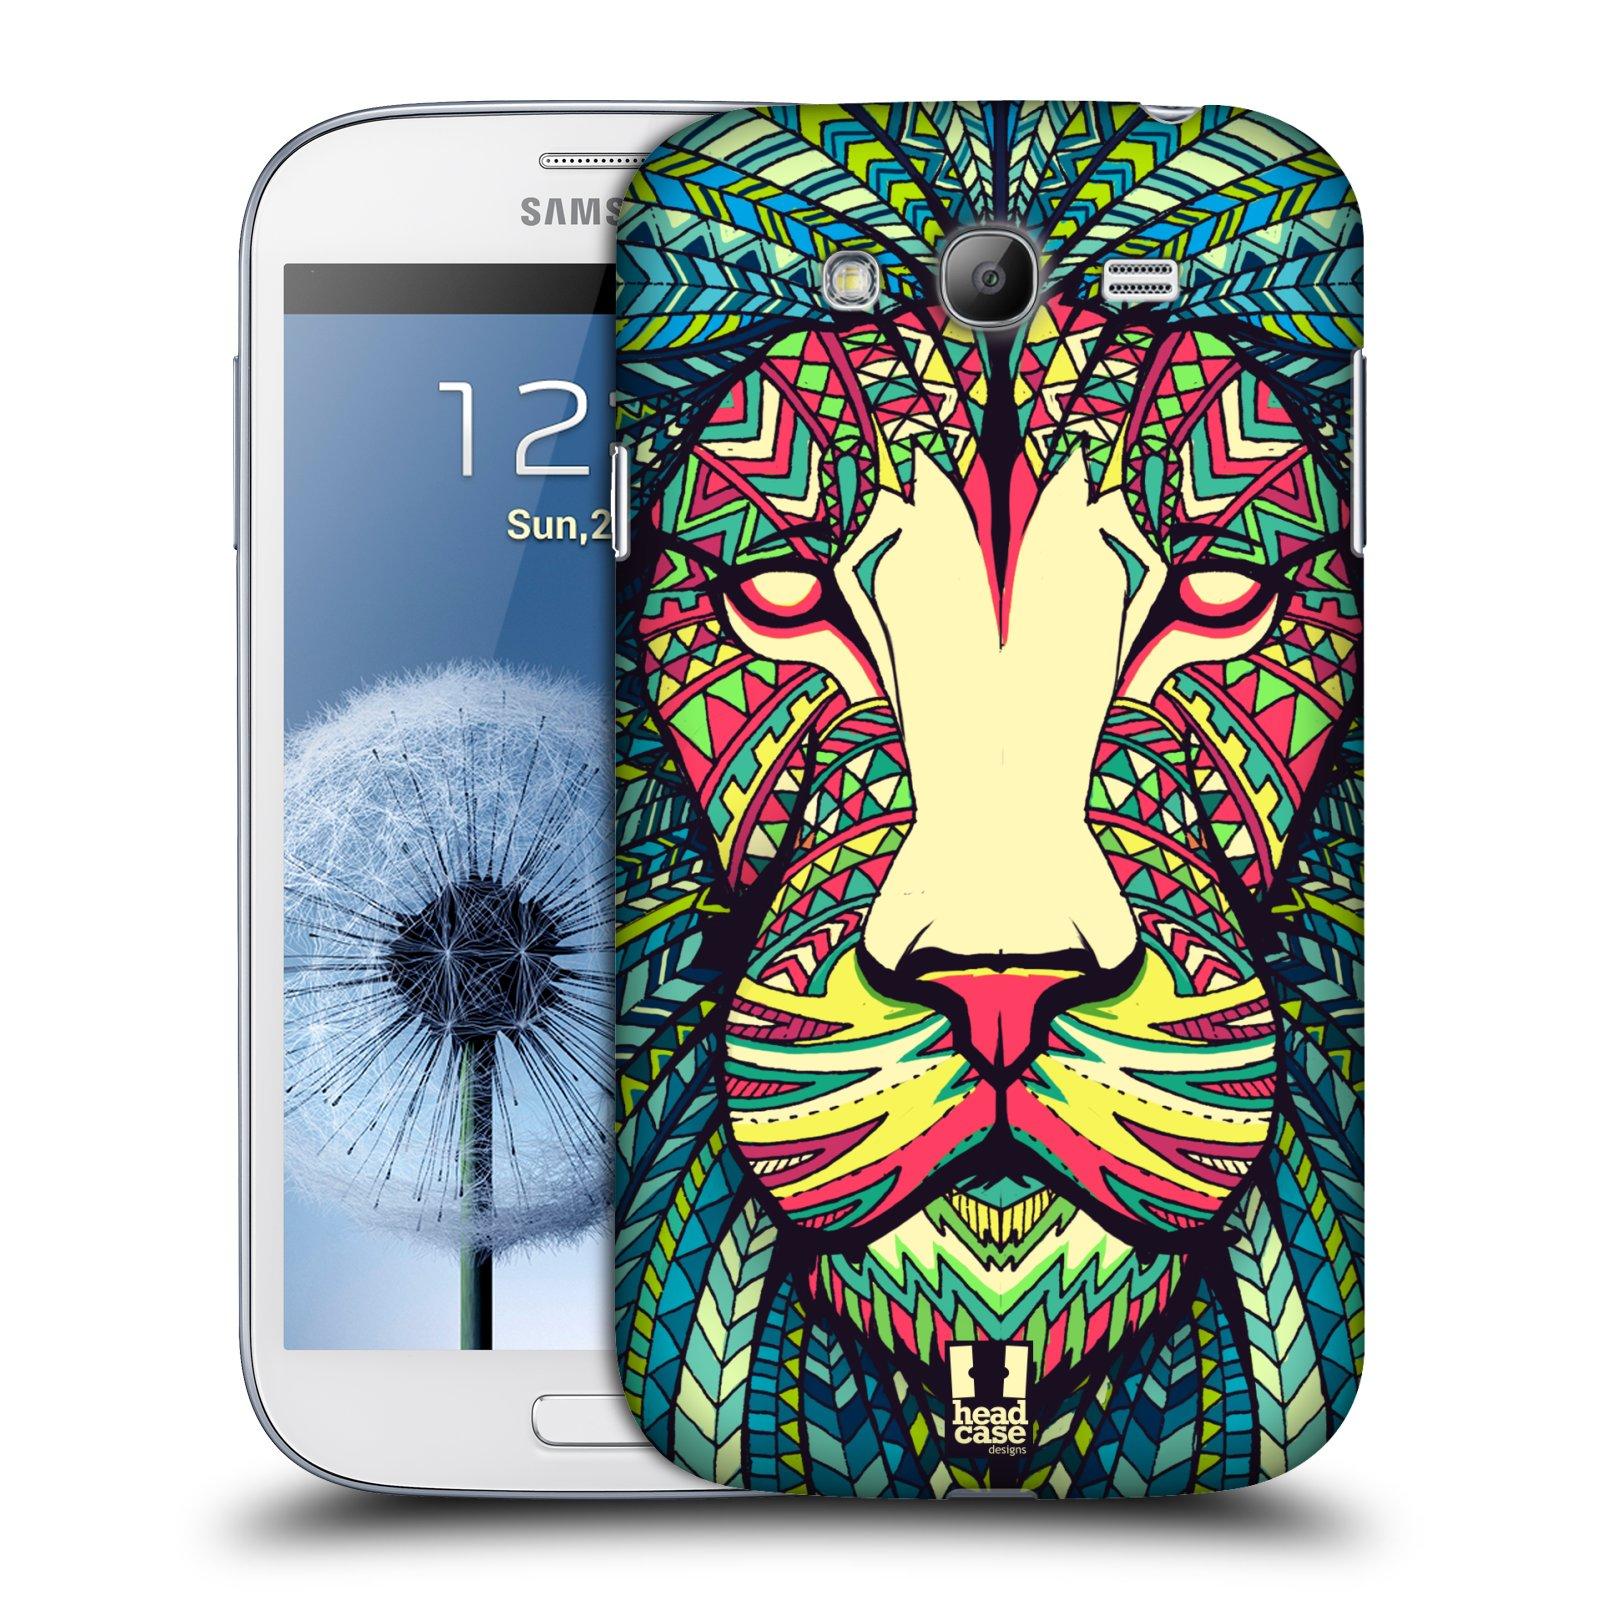 HEAD CASE plastový obal na mobil SAMSUNG GALAXY Grand i9080 vzor Aztécký motiv zvíře lev